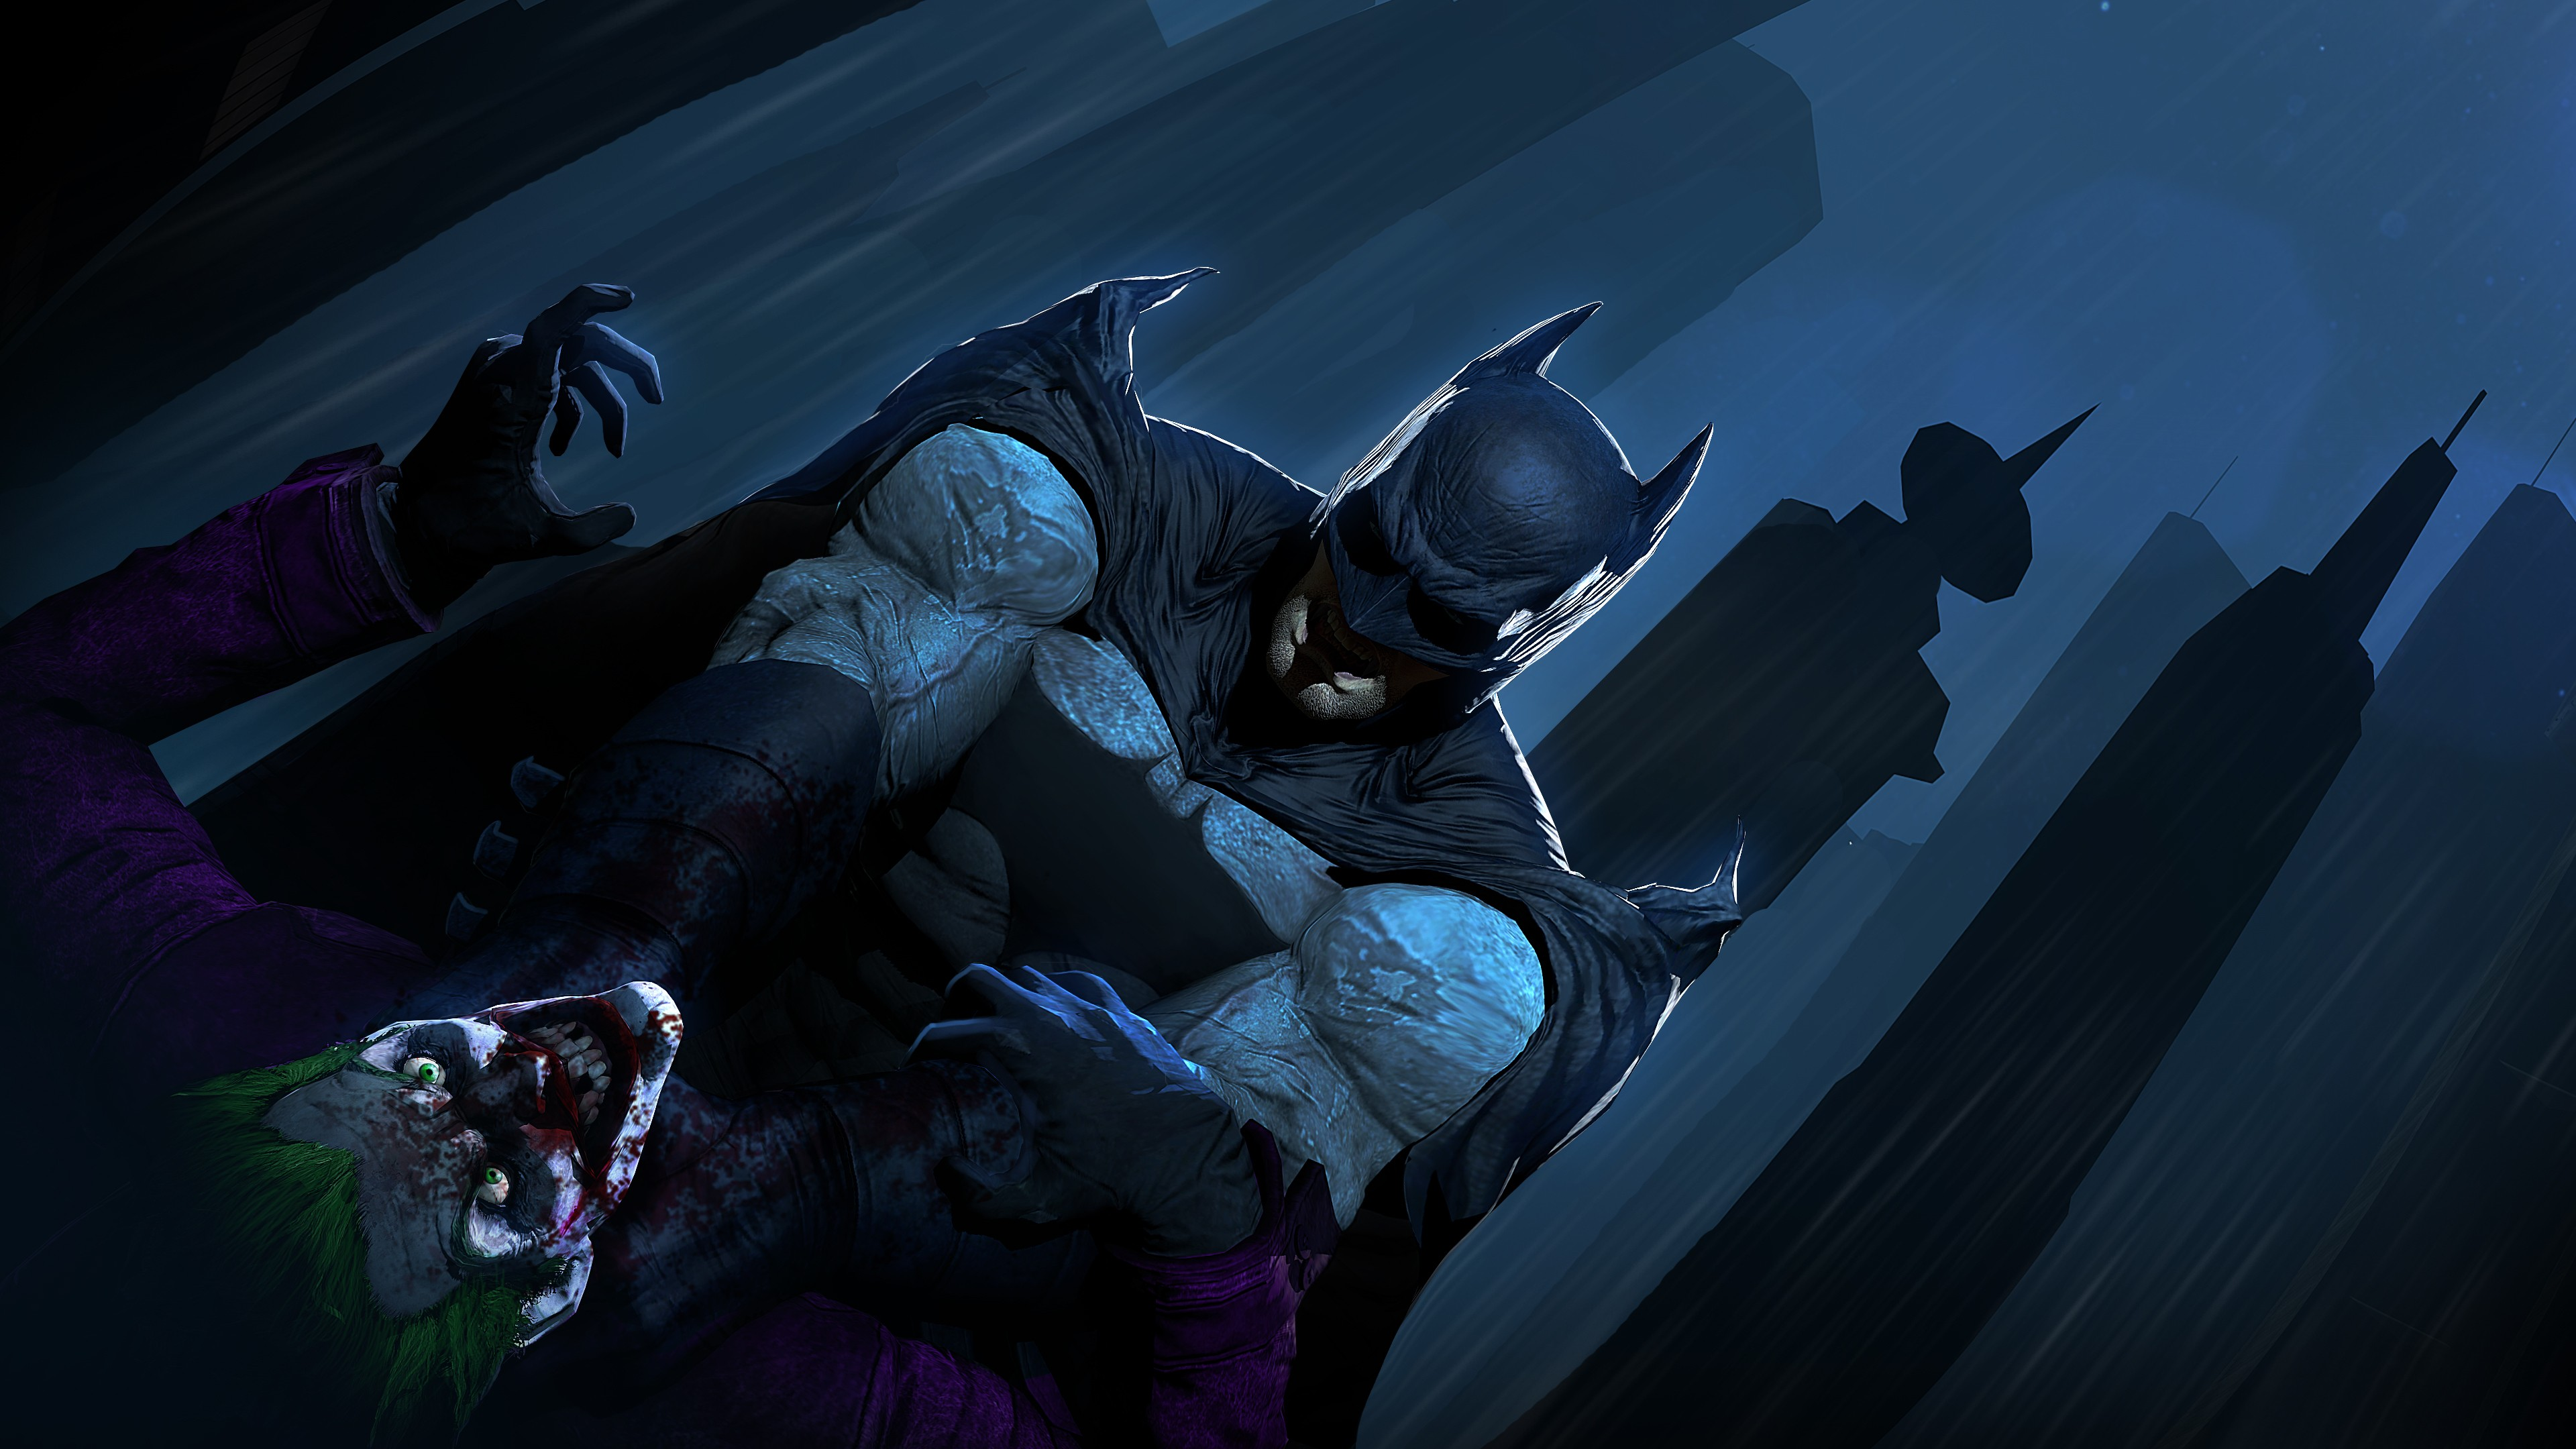 joker vs batman 4k 1536521959 - Joker Vs Batman 4k - superheroes wallpapers, joker wallpapers, hd-wallpapers, dc comics wallpapers, comics wallpapers, batman wallpapers, 4k-wallpapers